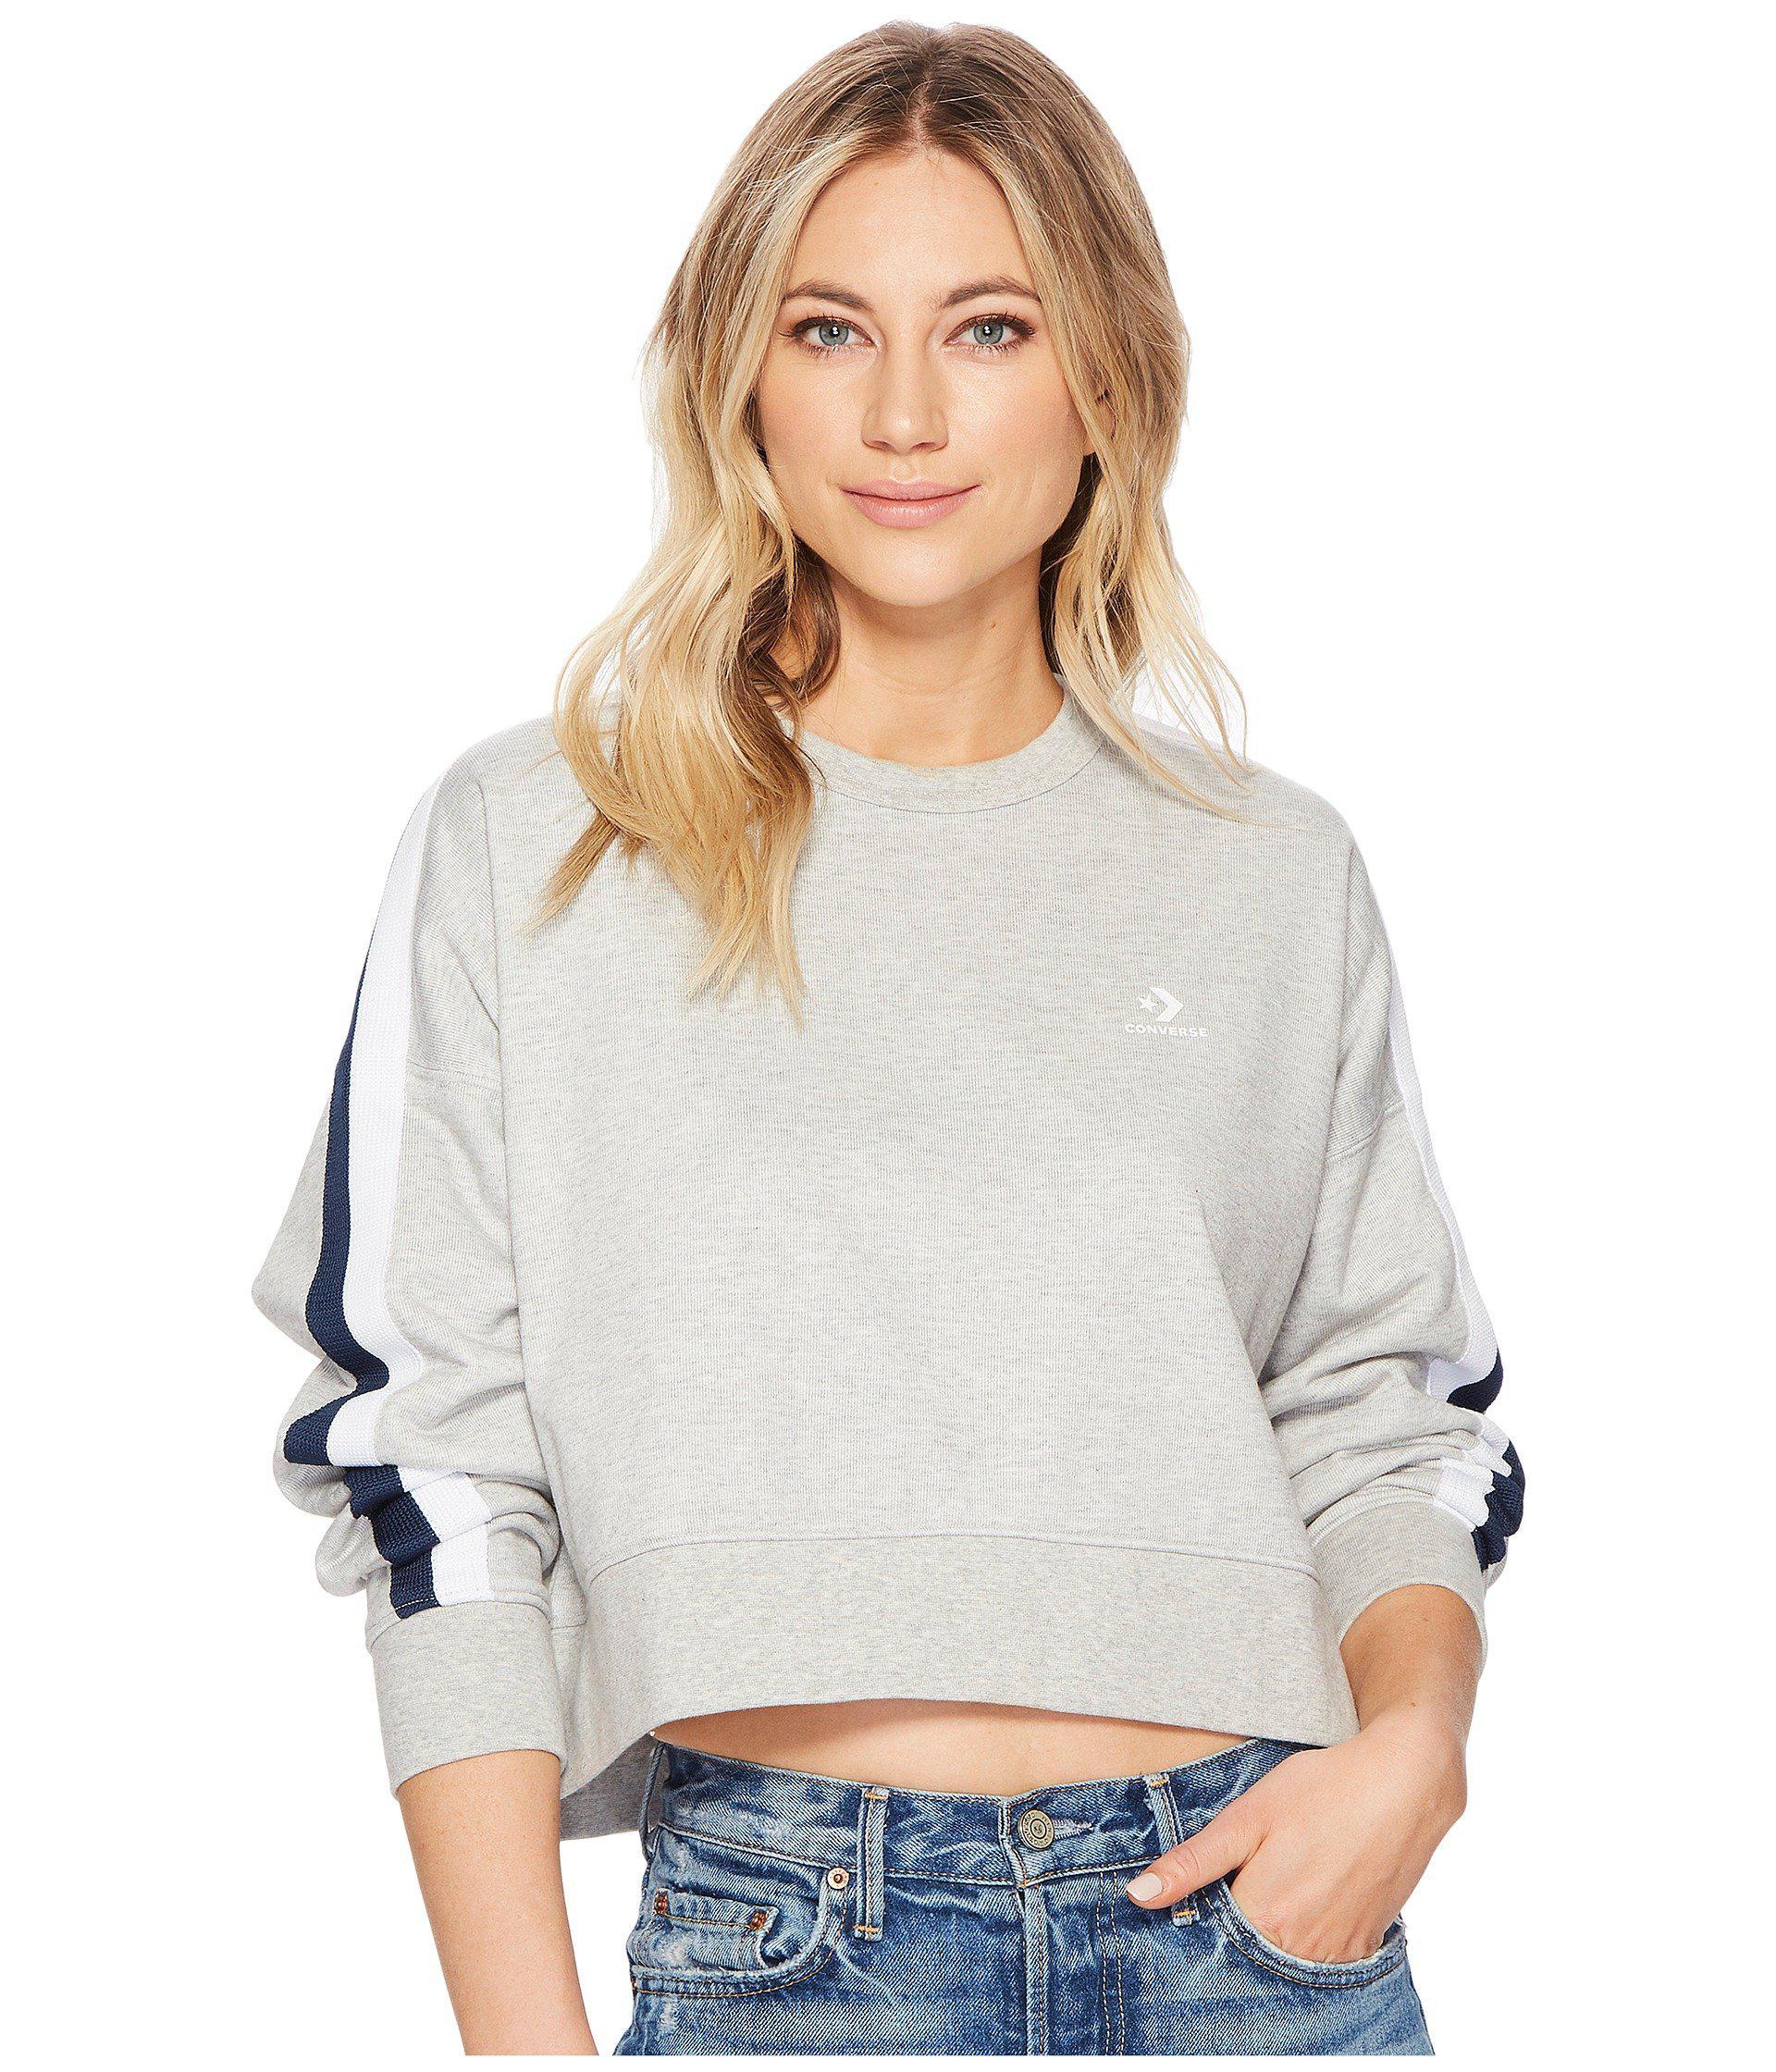 Converse Women's Star Chevron Cropped Track Crew Sweatshirt